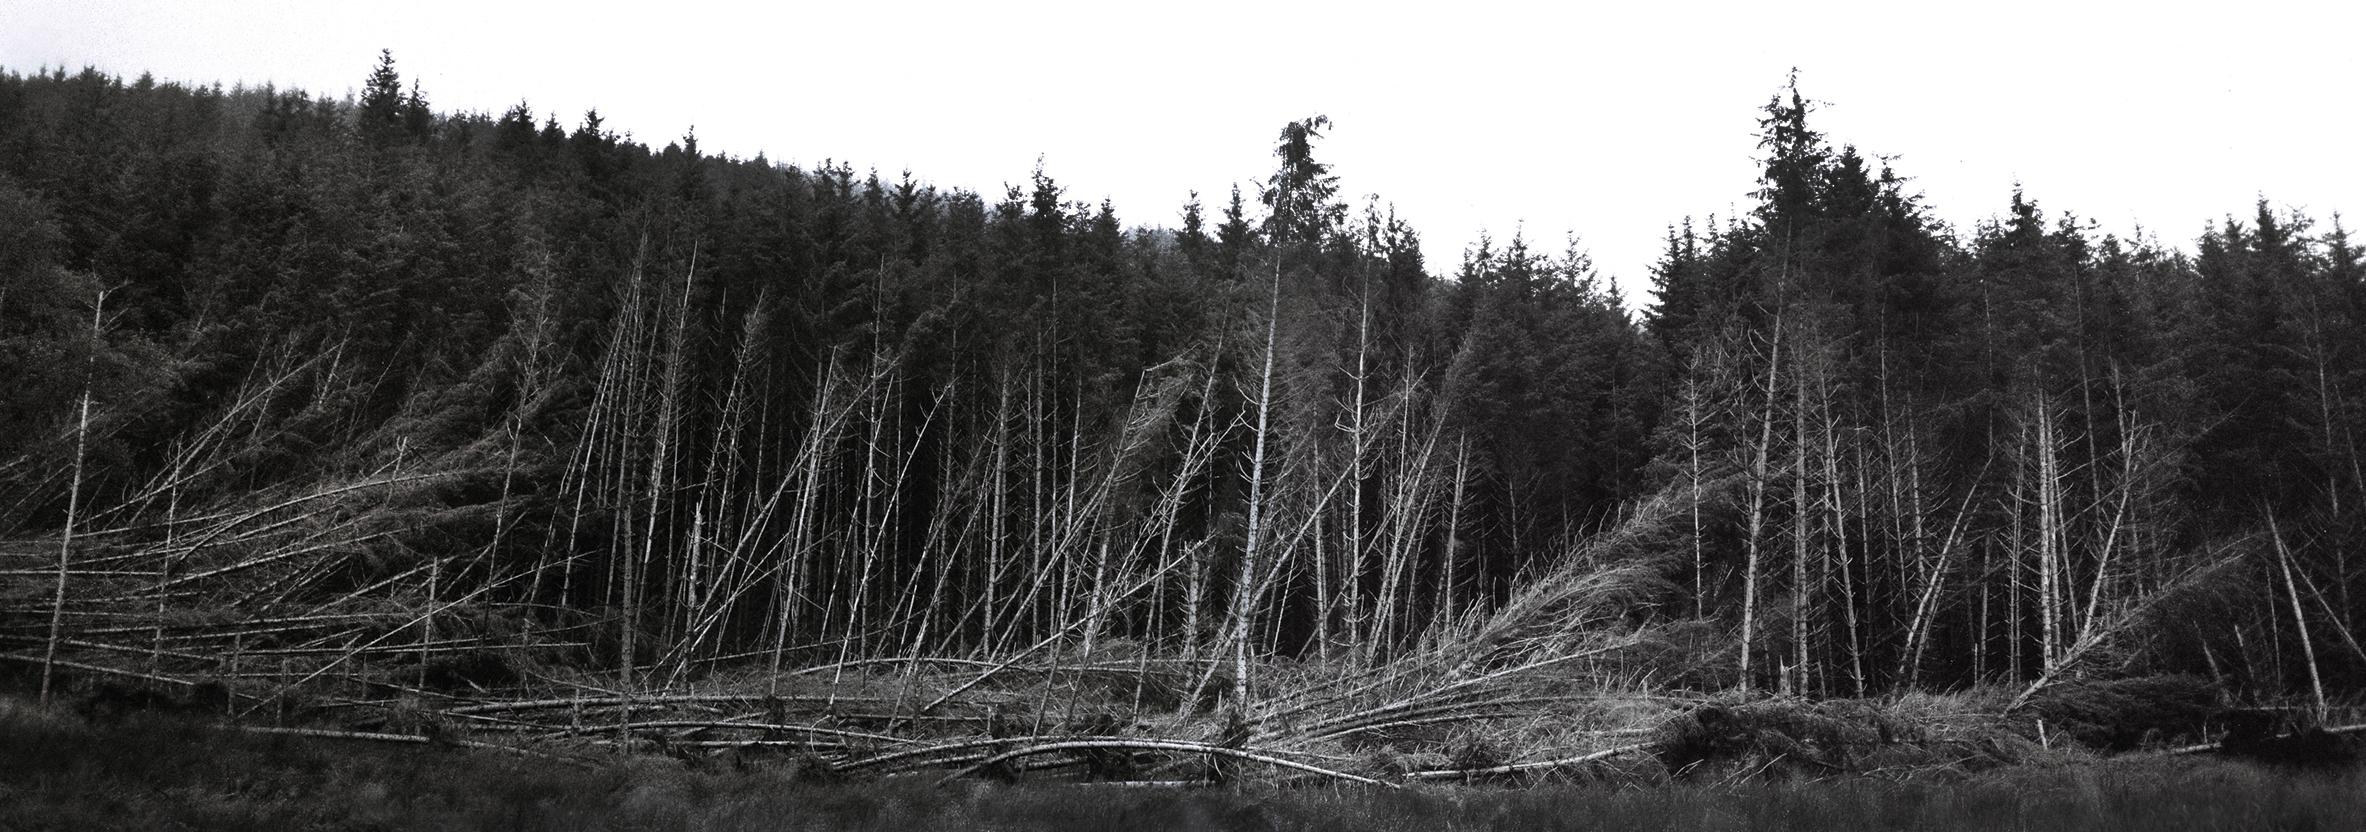 Fallen trees. Tayvallich, Scotland. 2017